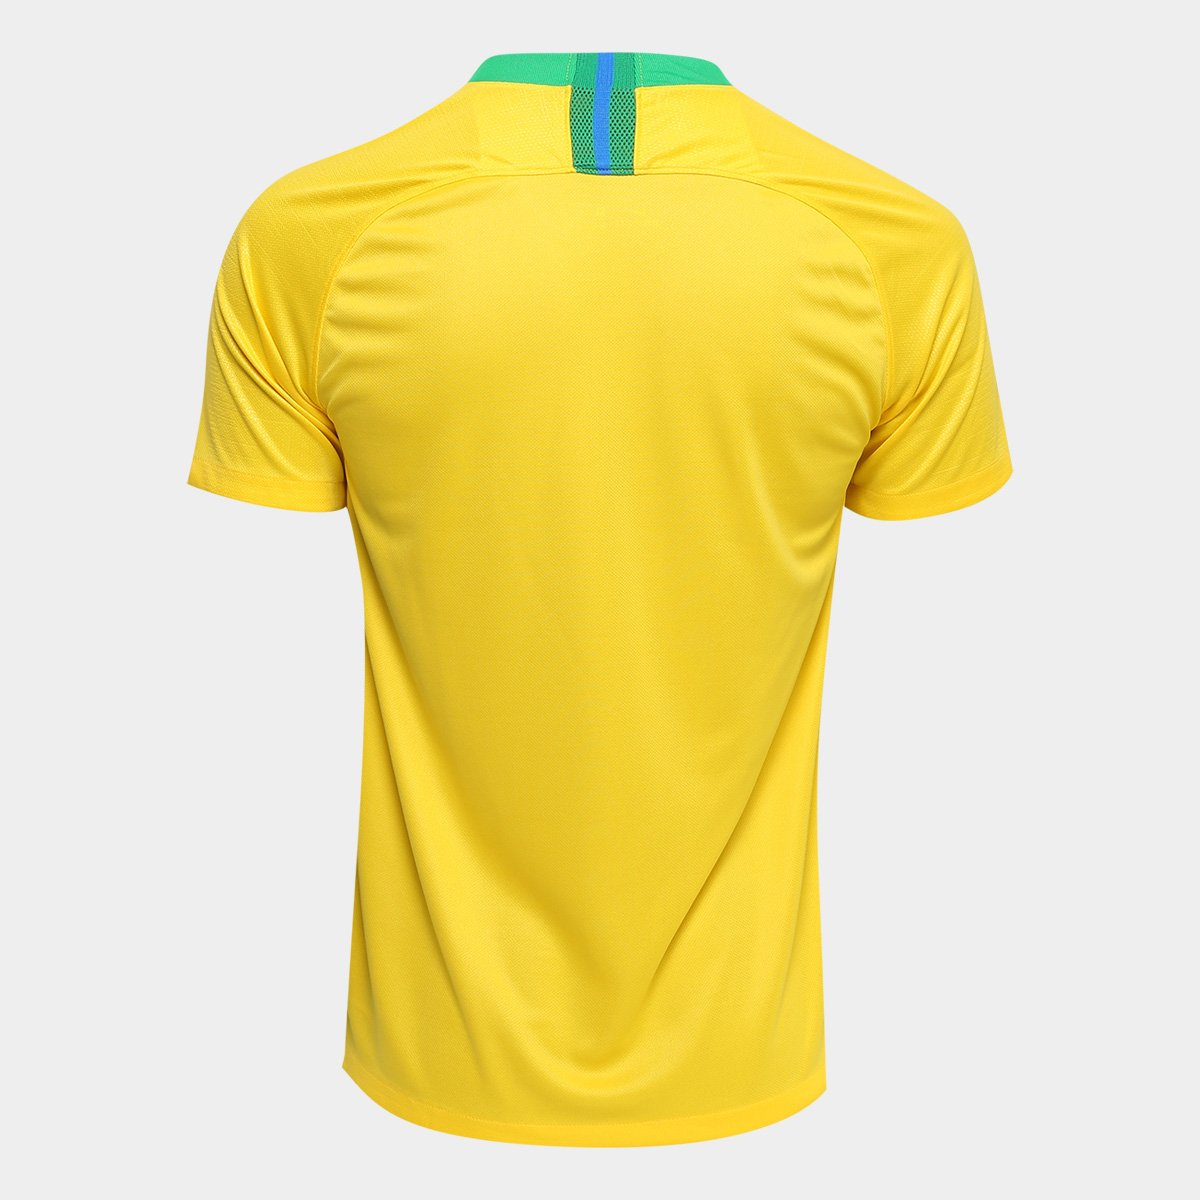 ... Camisa Seleção Brasil I 2018 s n° - Torcedor Nike Masculina ... 15d987ce16